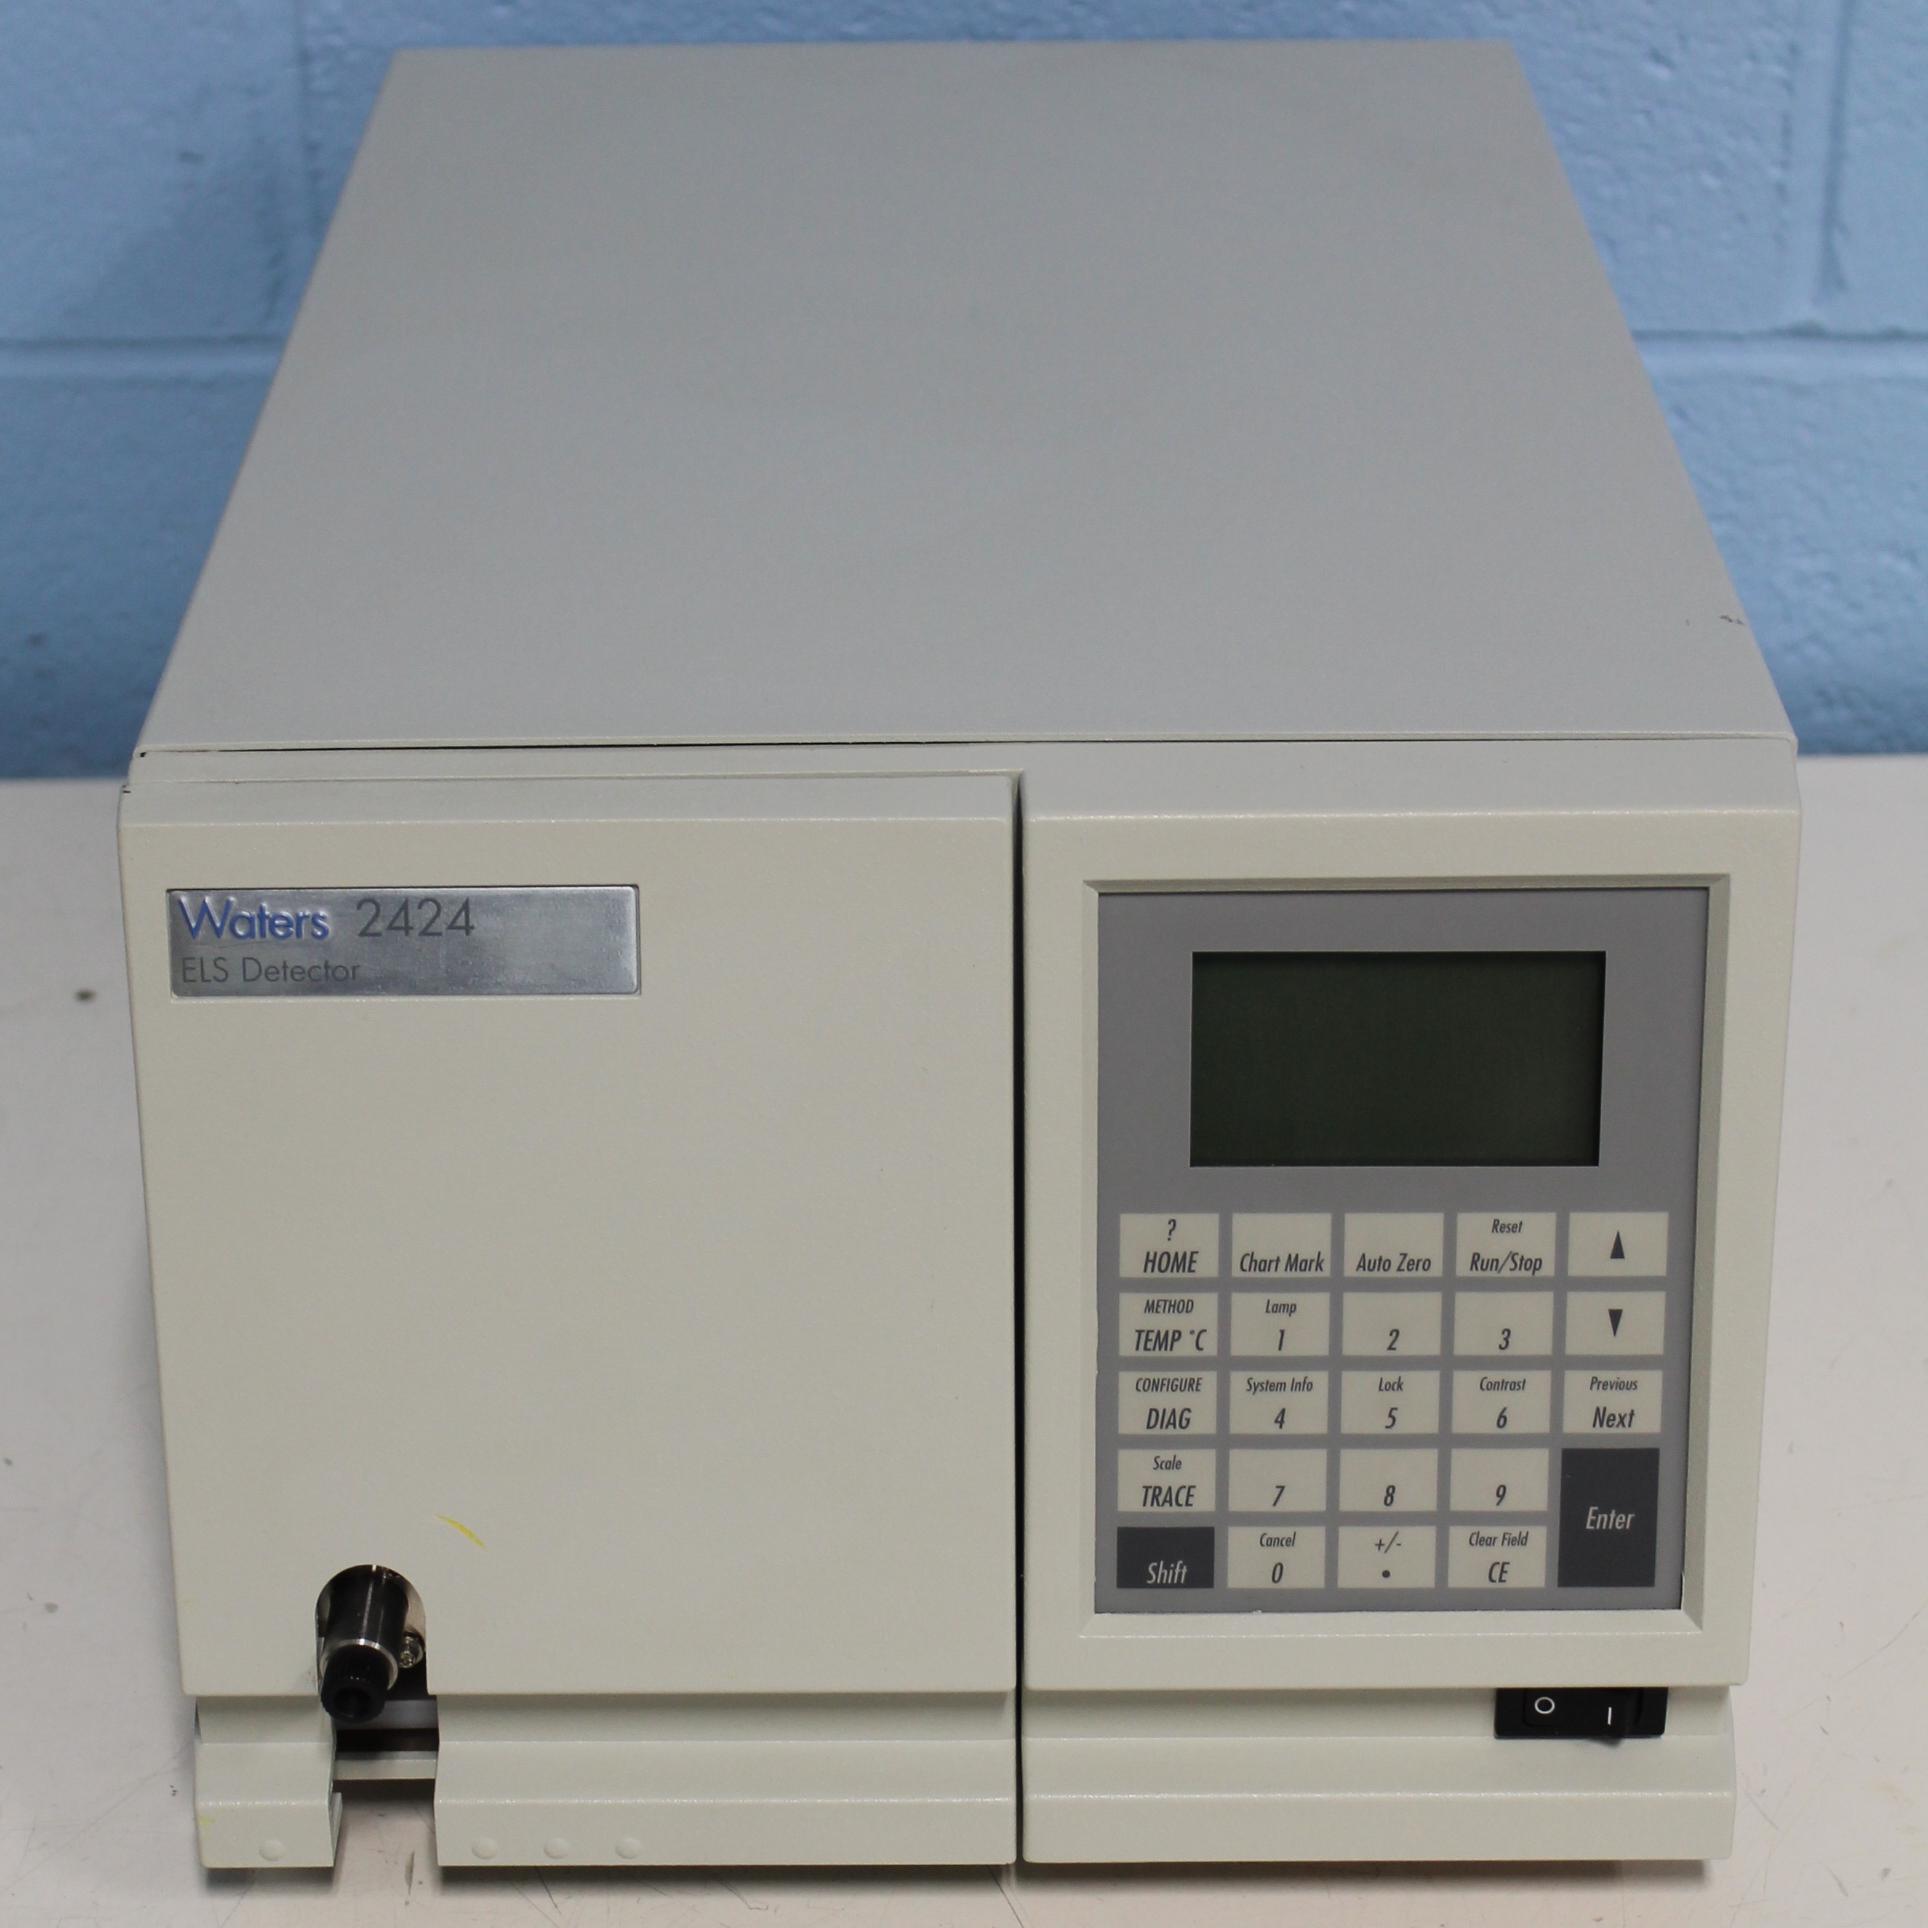 Waters 2424 Evaporative Light Scattering (ELS) Detector Image